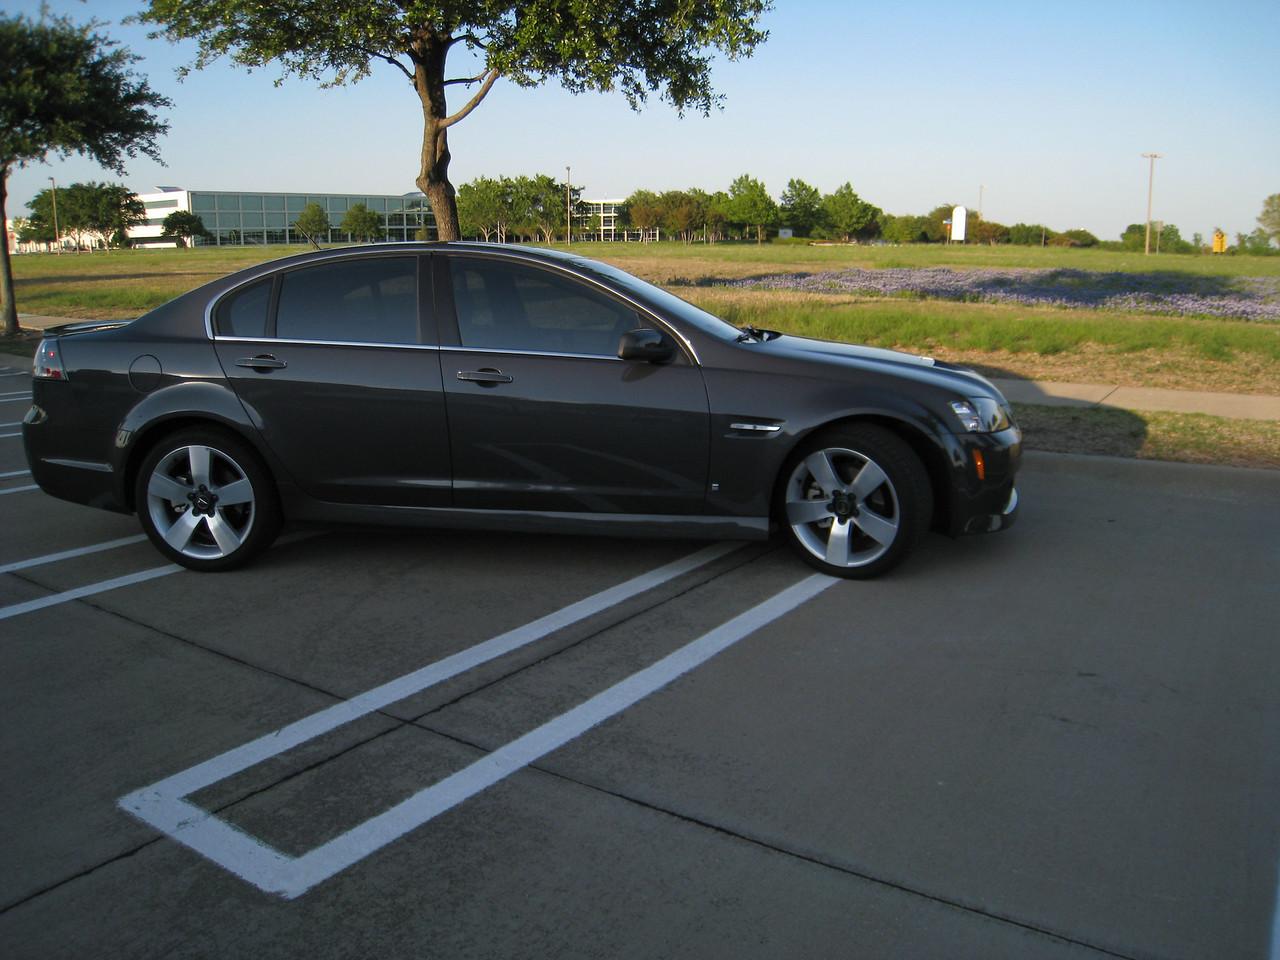 2009 Pontiac G8 GT - Magnetic Gray Metallic - April 20, 2009